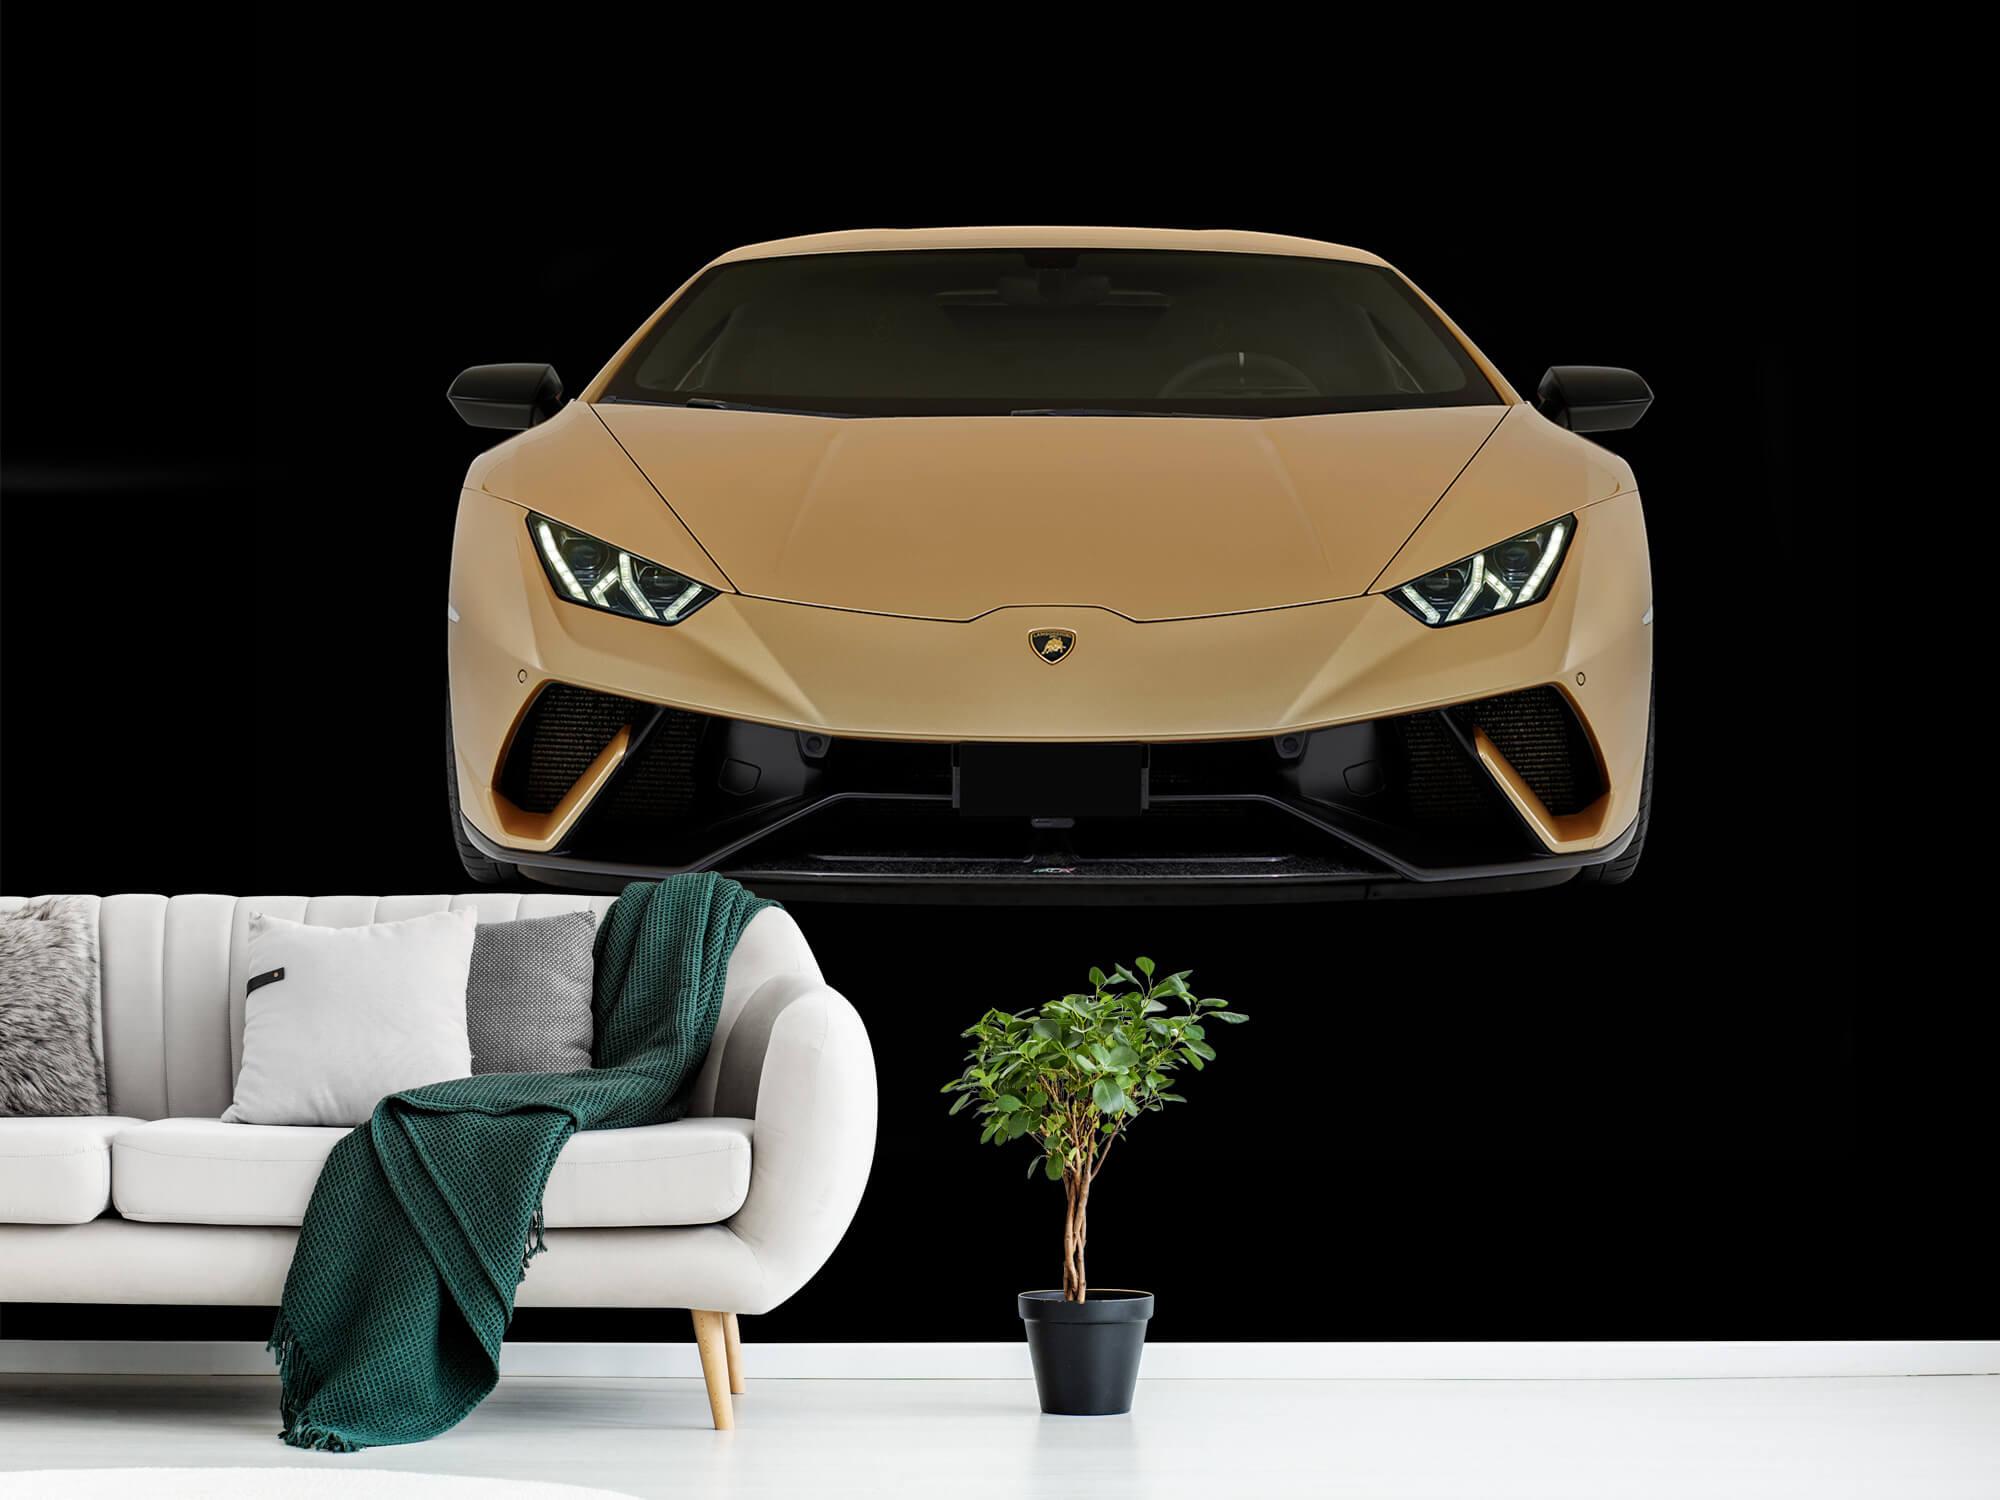 Wallpaper Lamborghini Huracán - Voorkant, zwart 1